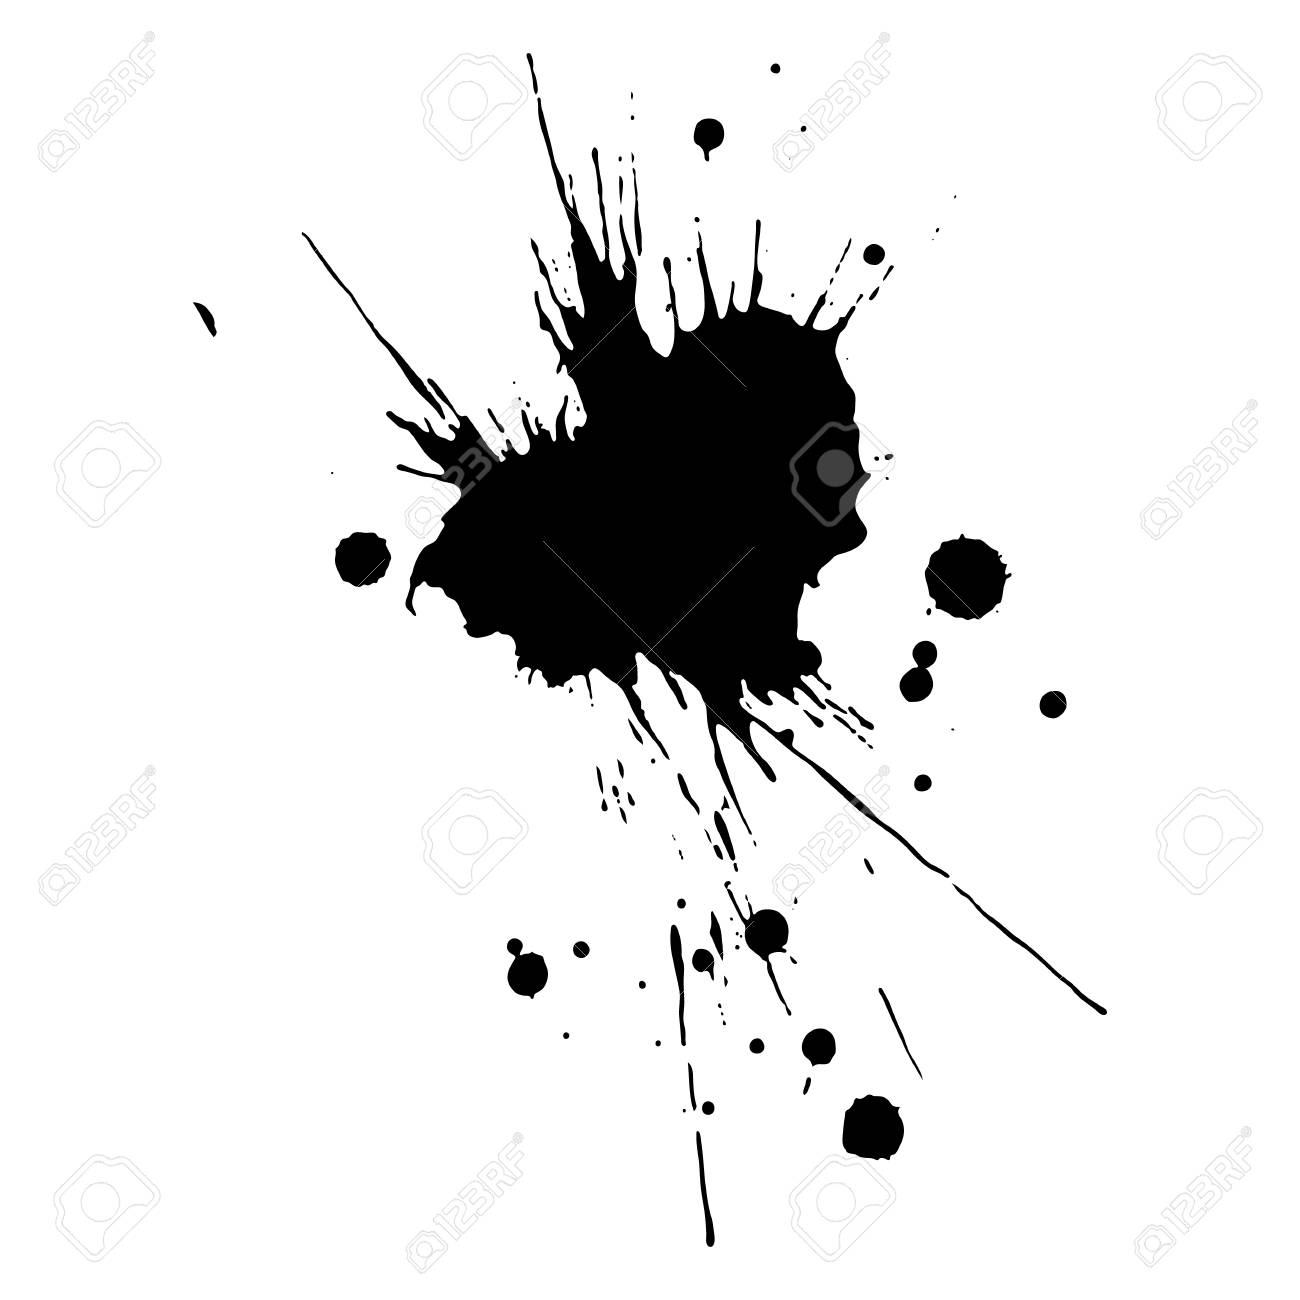 Black ink drop and splash, vector illustration clip art.